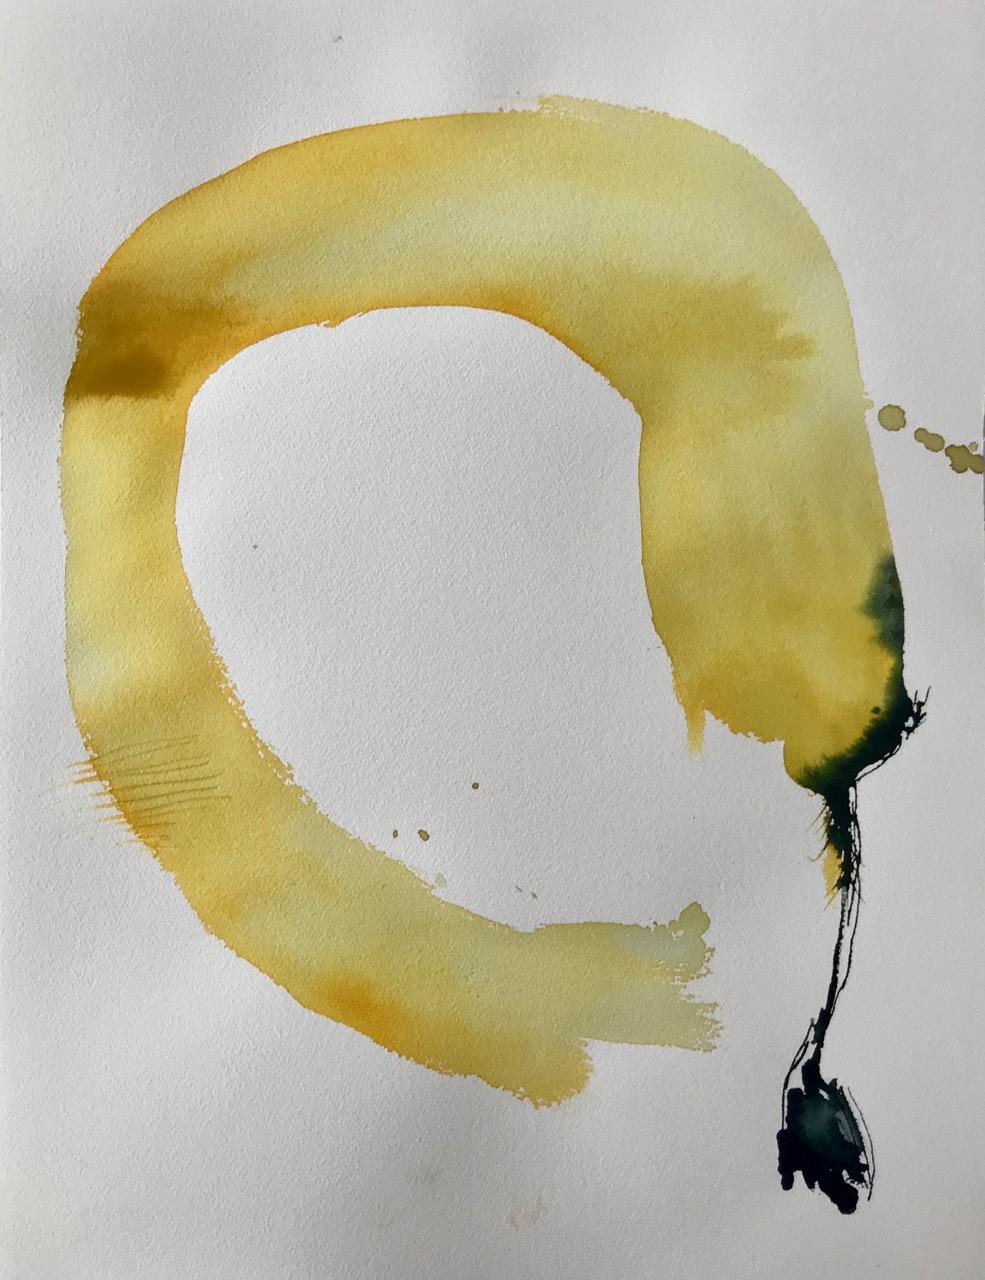 Bananana, Pt.1, Aquarell und Tusche auf Papier, 46 x 61 cm, 2018